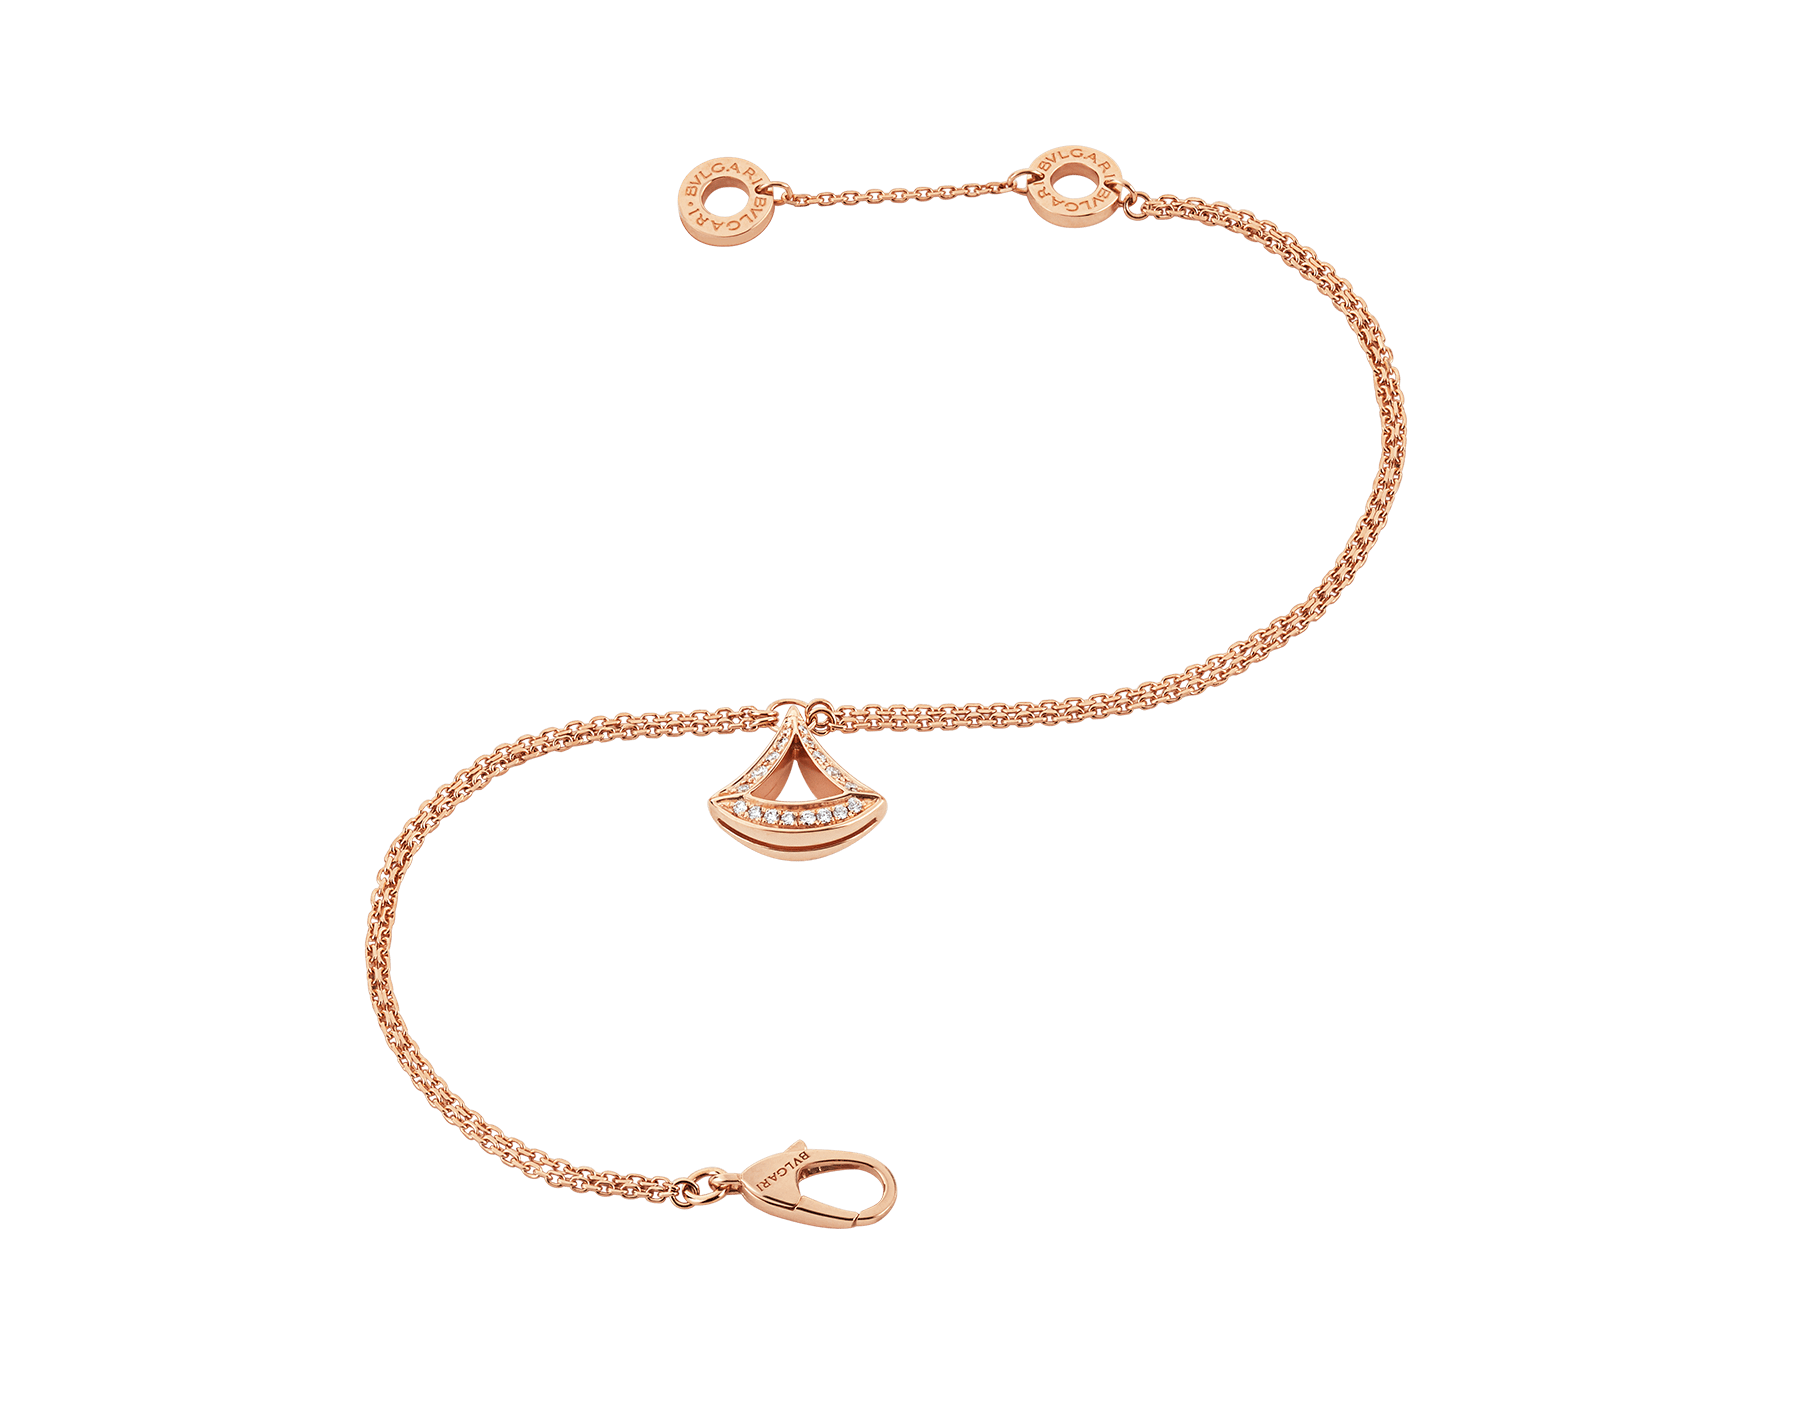 DIVAS' DREAM 18 kt rose gold openwork bracelet with 18 kt rose gold pendant set with pavé diamonds. BR858254 image 2